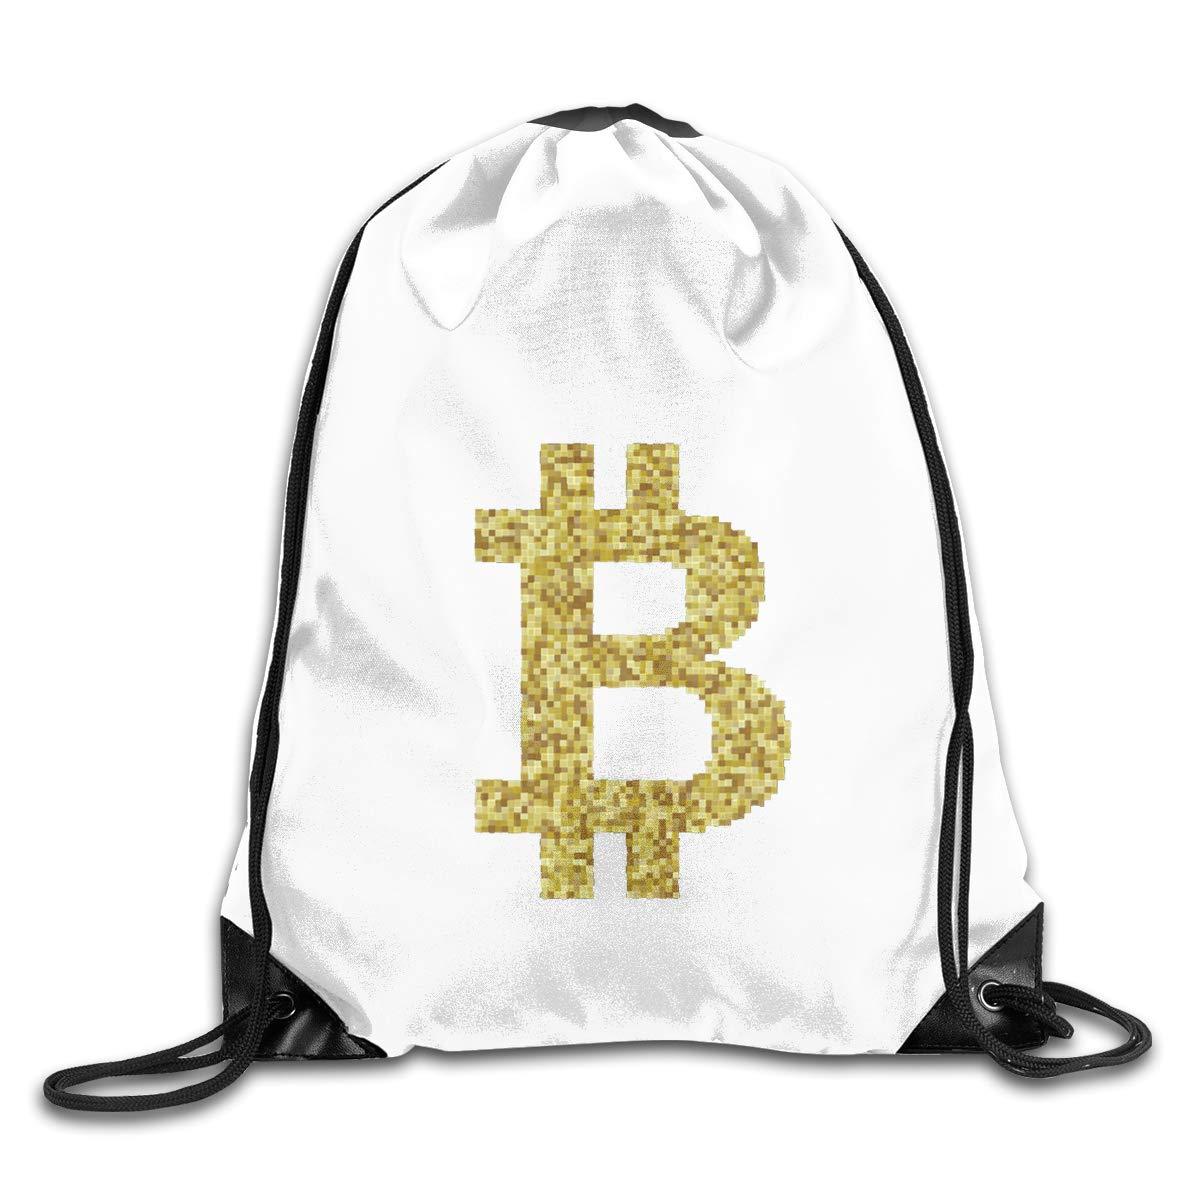 Bitcoin Logo Bitcoin Sign Drawstring Bags Eat Sleep Dance Repeat Beam Mouth Backpack Basketball Tennis Gympack